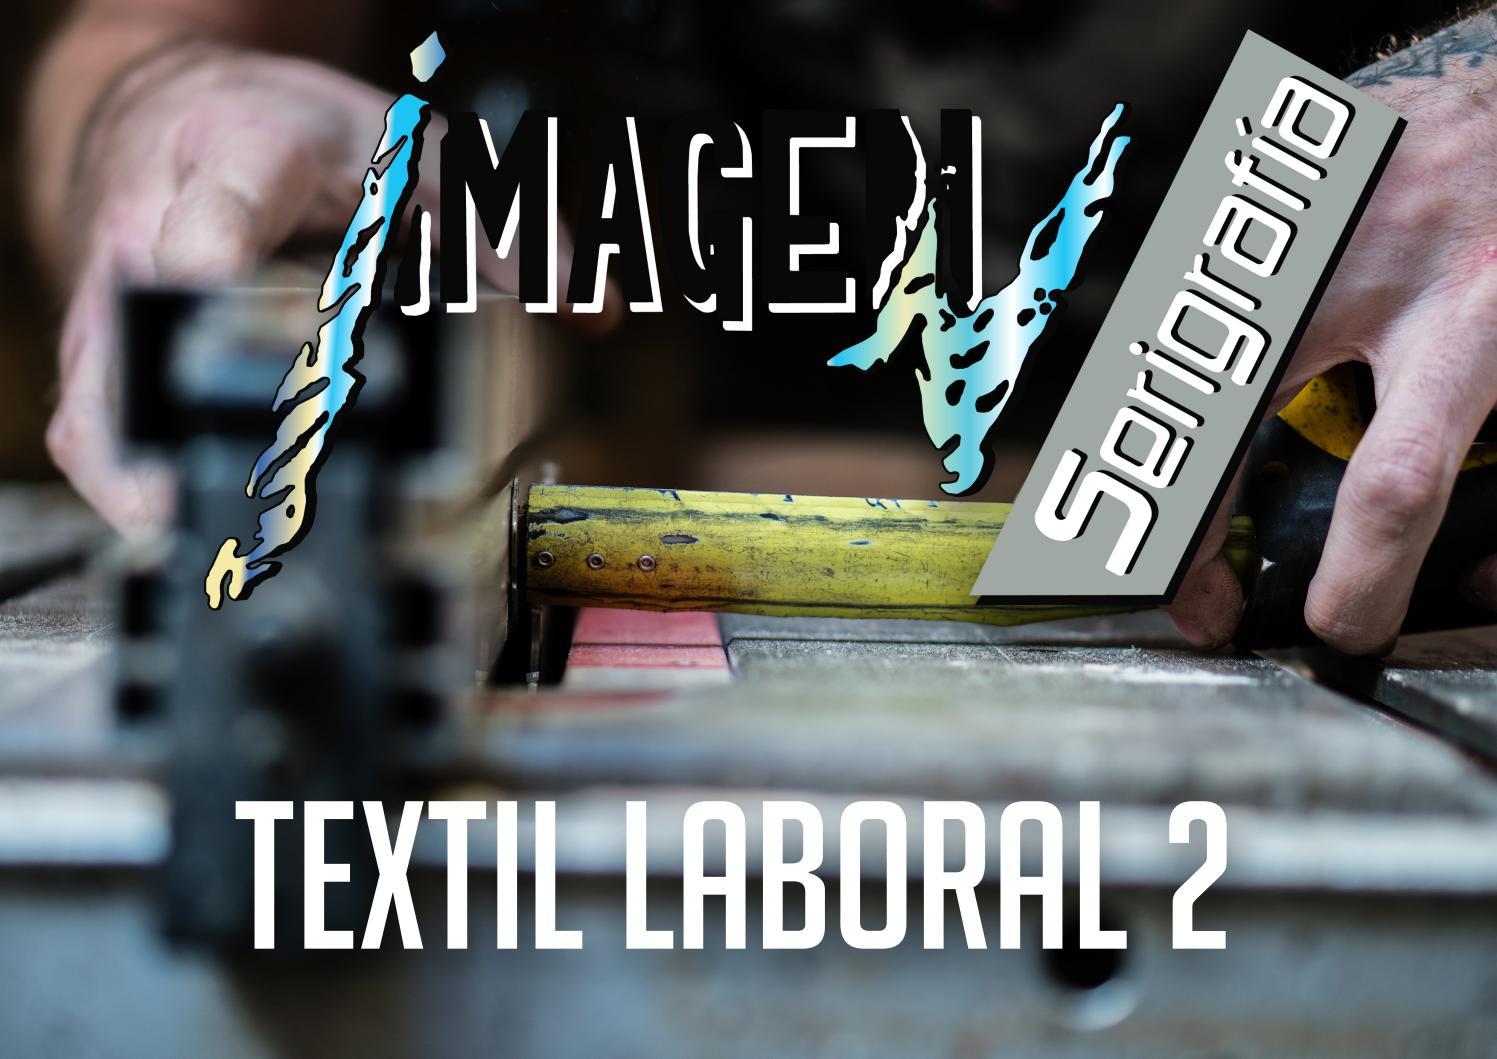 Catálogo Textil Laboral 2 - Imagen Serigrafía Cáceres by Utopia Brand ® -  issuu d42f193ad2577